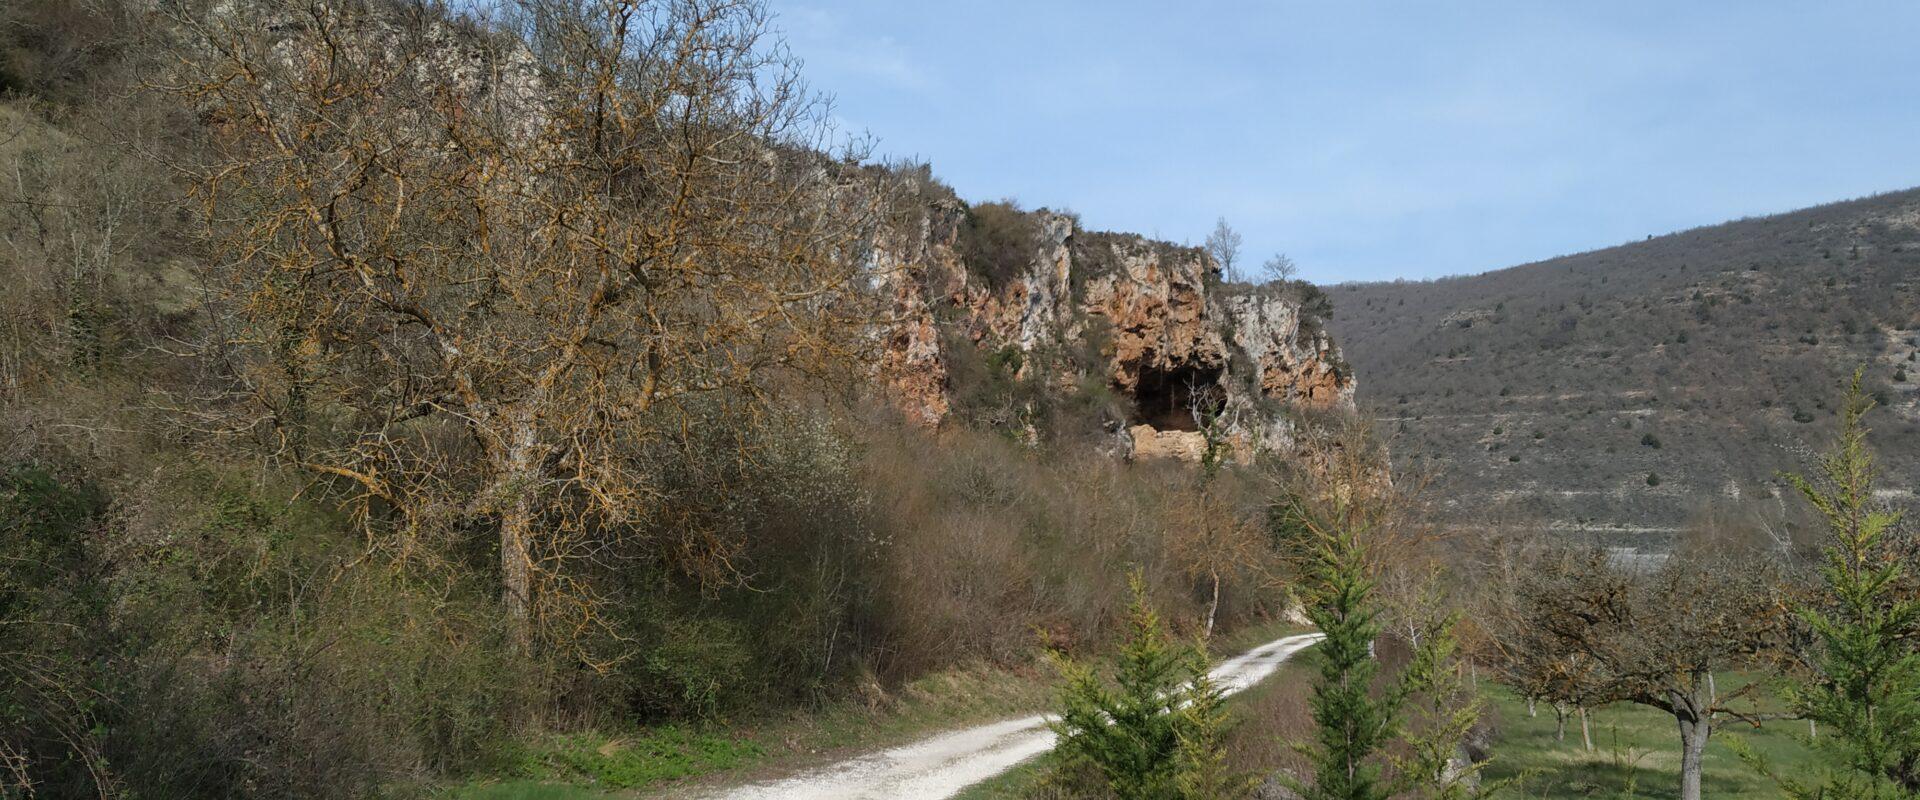 Territorio Megalítico